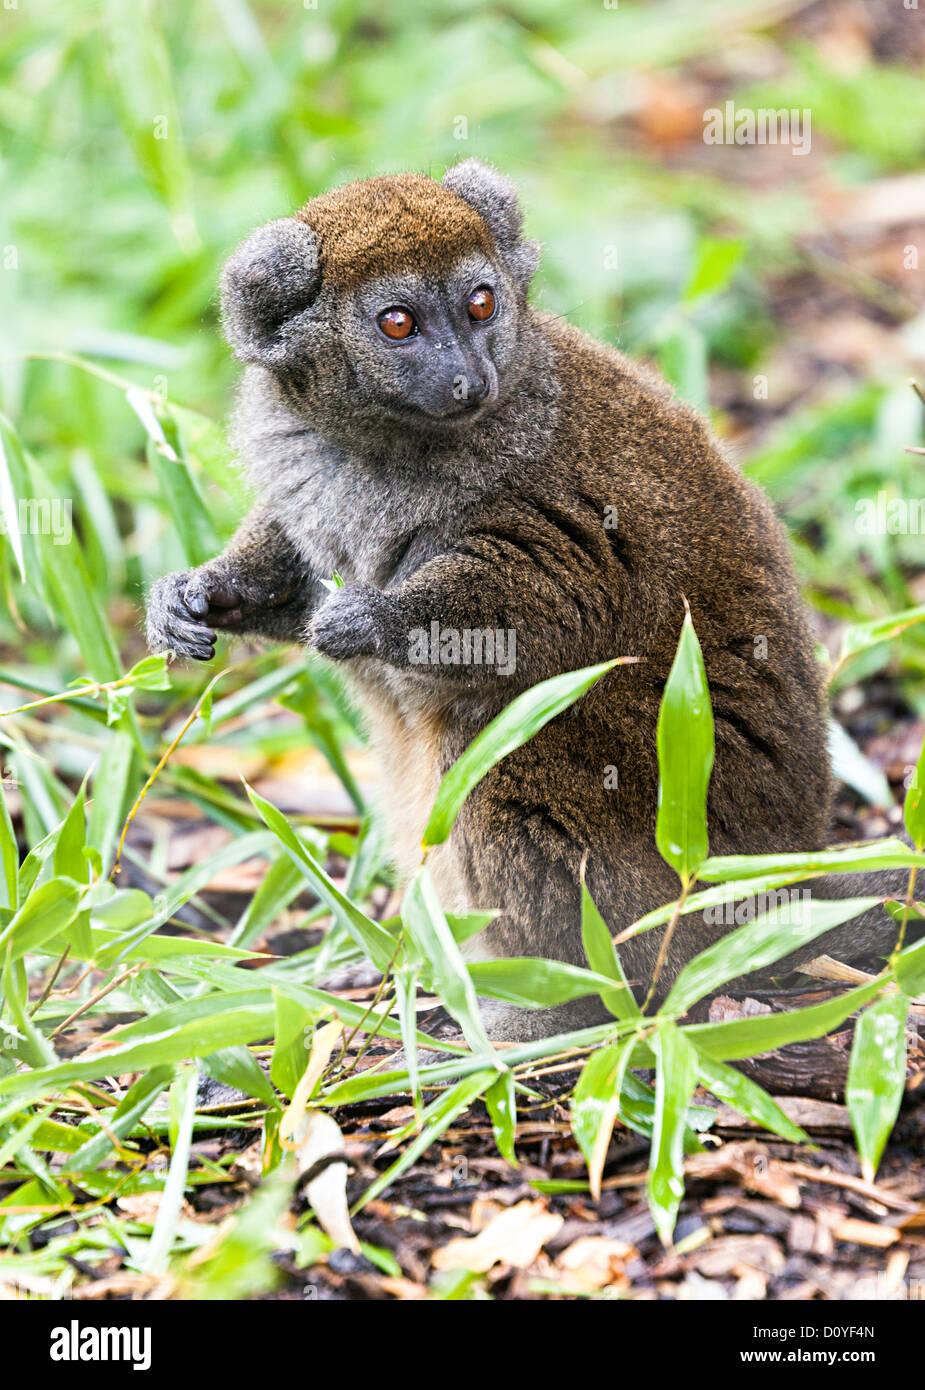 Alaotran gentle lemur, Hapalemur alaotrensis, inhabitant of Madagascar - Stock Image